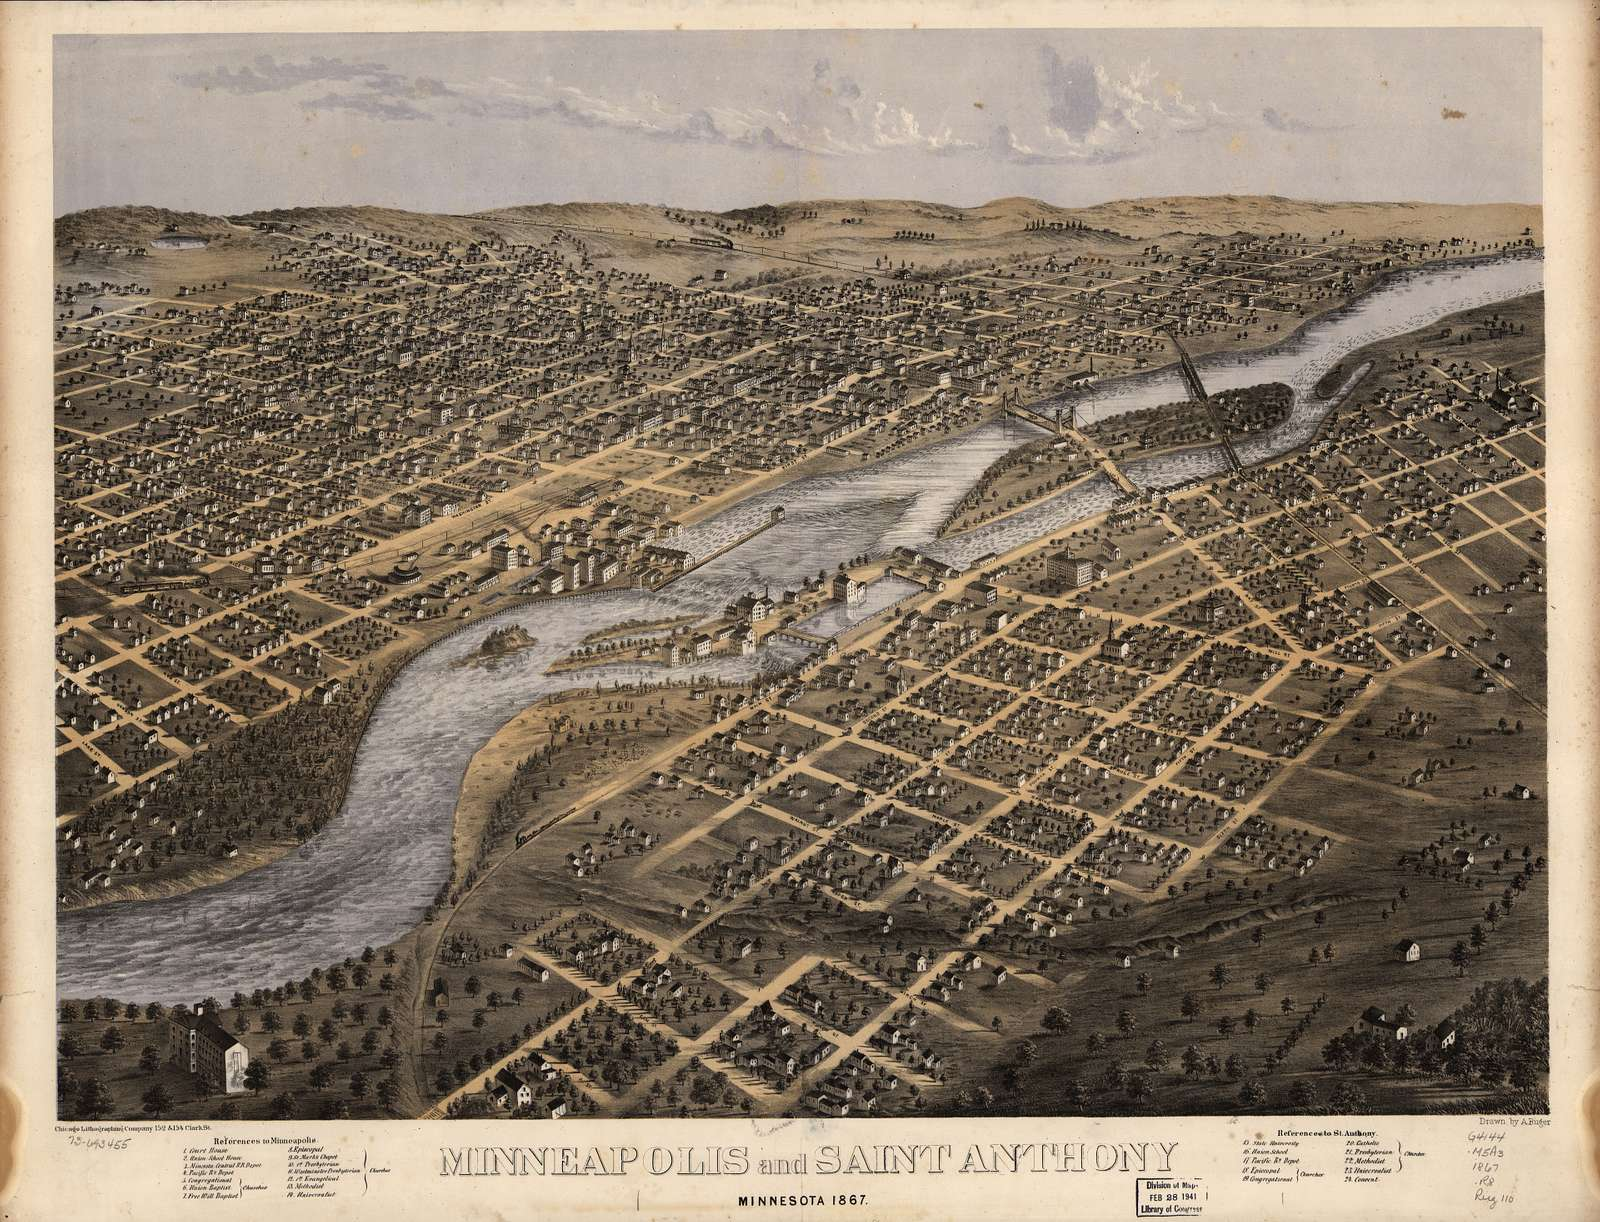 Minneapolis and Saint Anthony, Minnesota 1867.